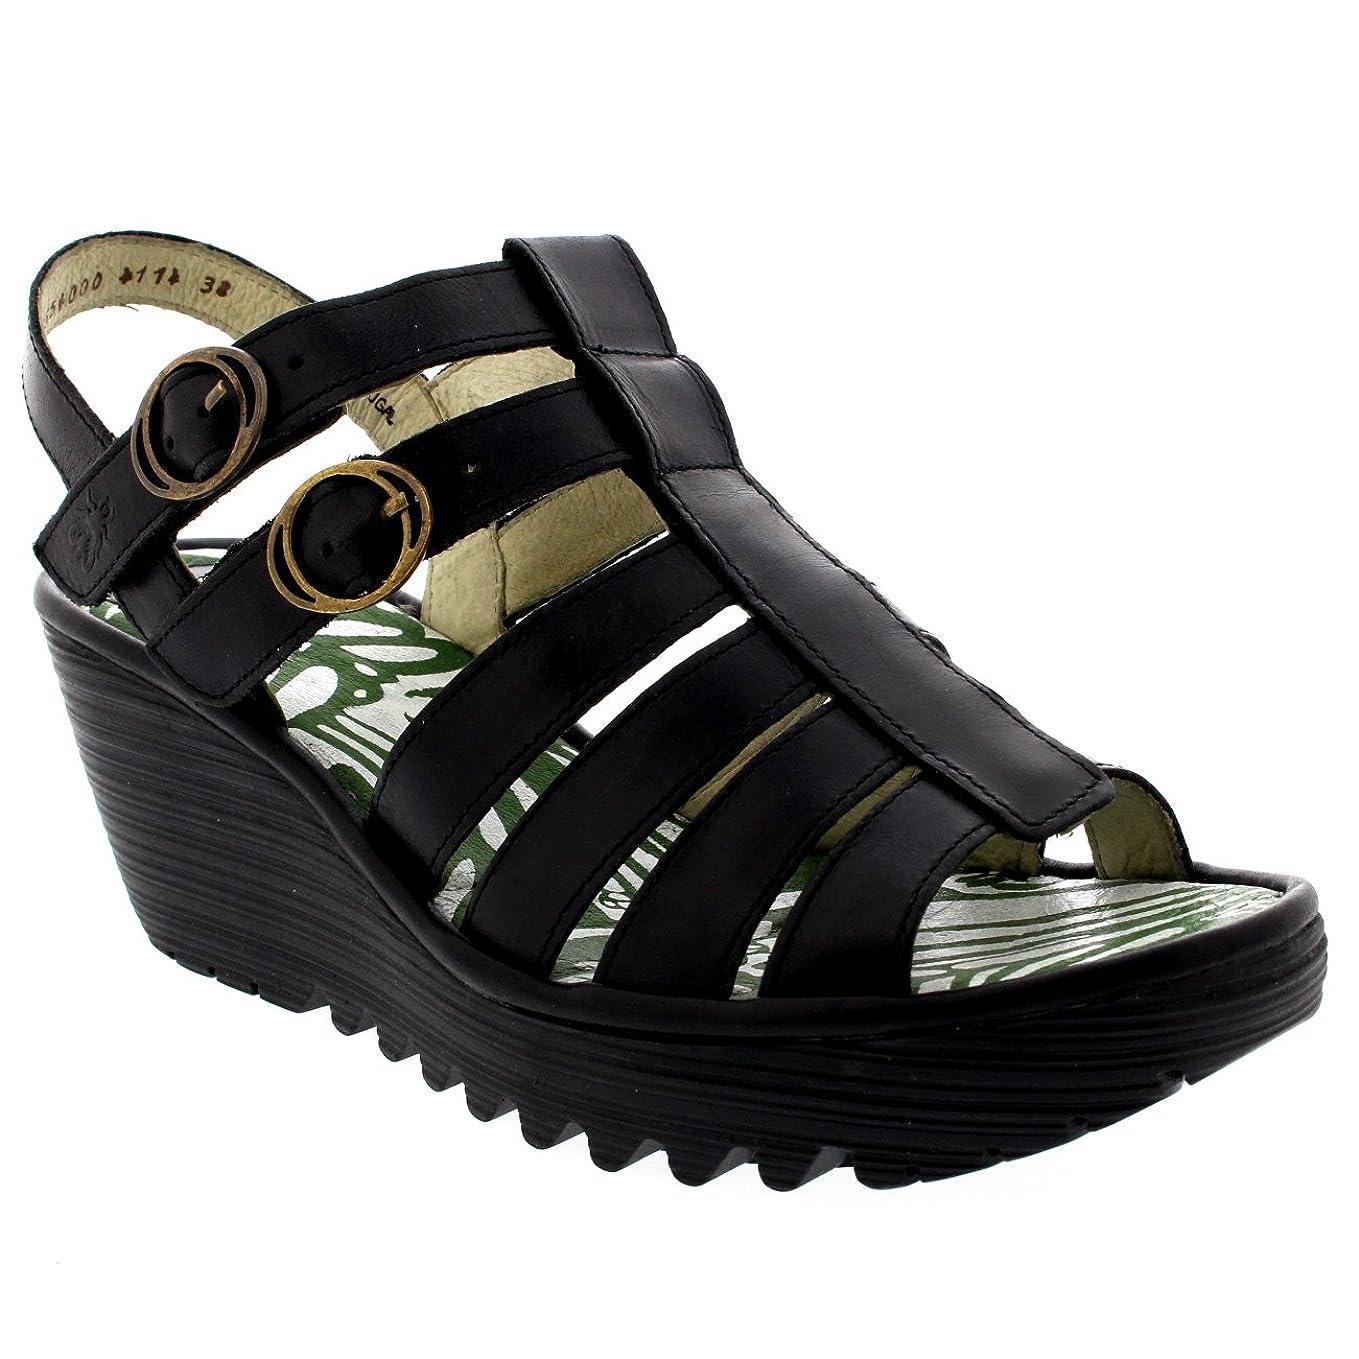 Womens Fly London Ygor Rug Wedge Beach Gladiator Vacation Heeled Sandals ap1208150259905